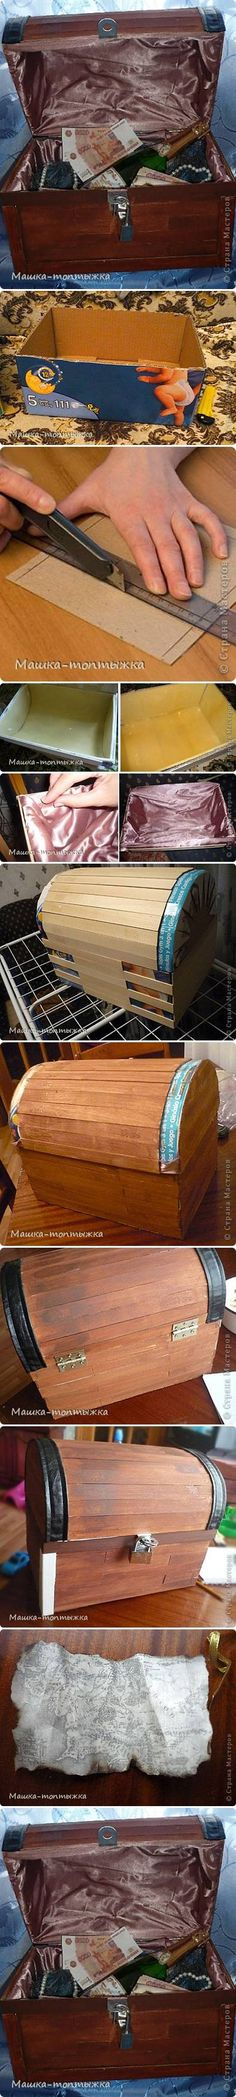 DIY Cardboard Treasure Box